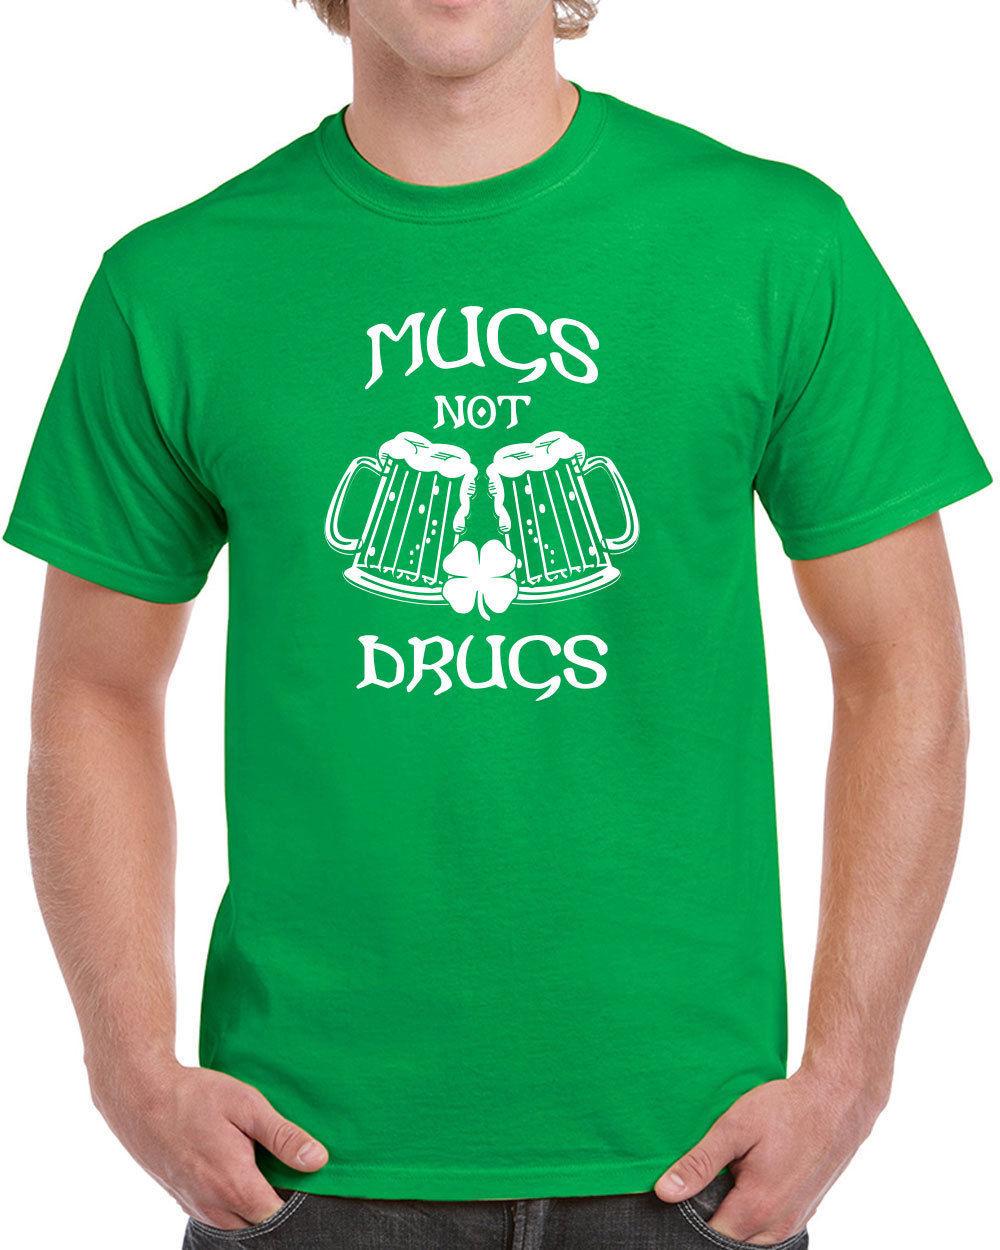 103 Mugs Not Drugs mens T-shirt Irish St. Patricks Day Ireland party beer drink